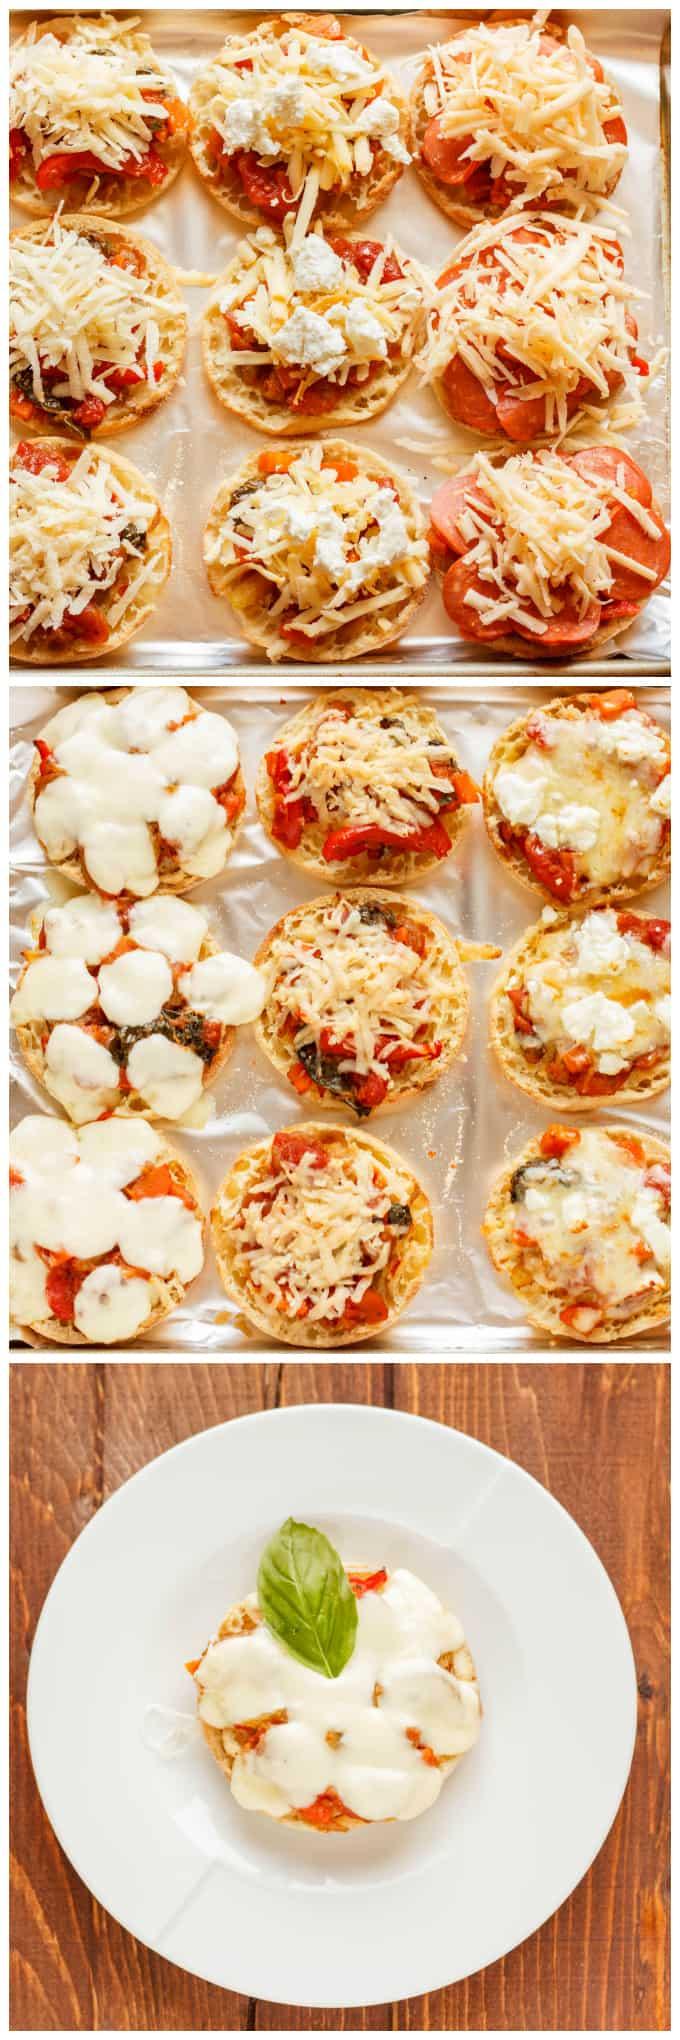 Mini Pizzas on English Muffins 1